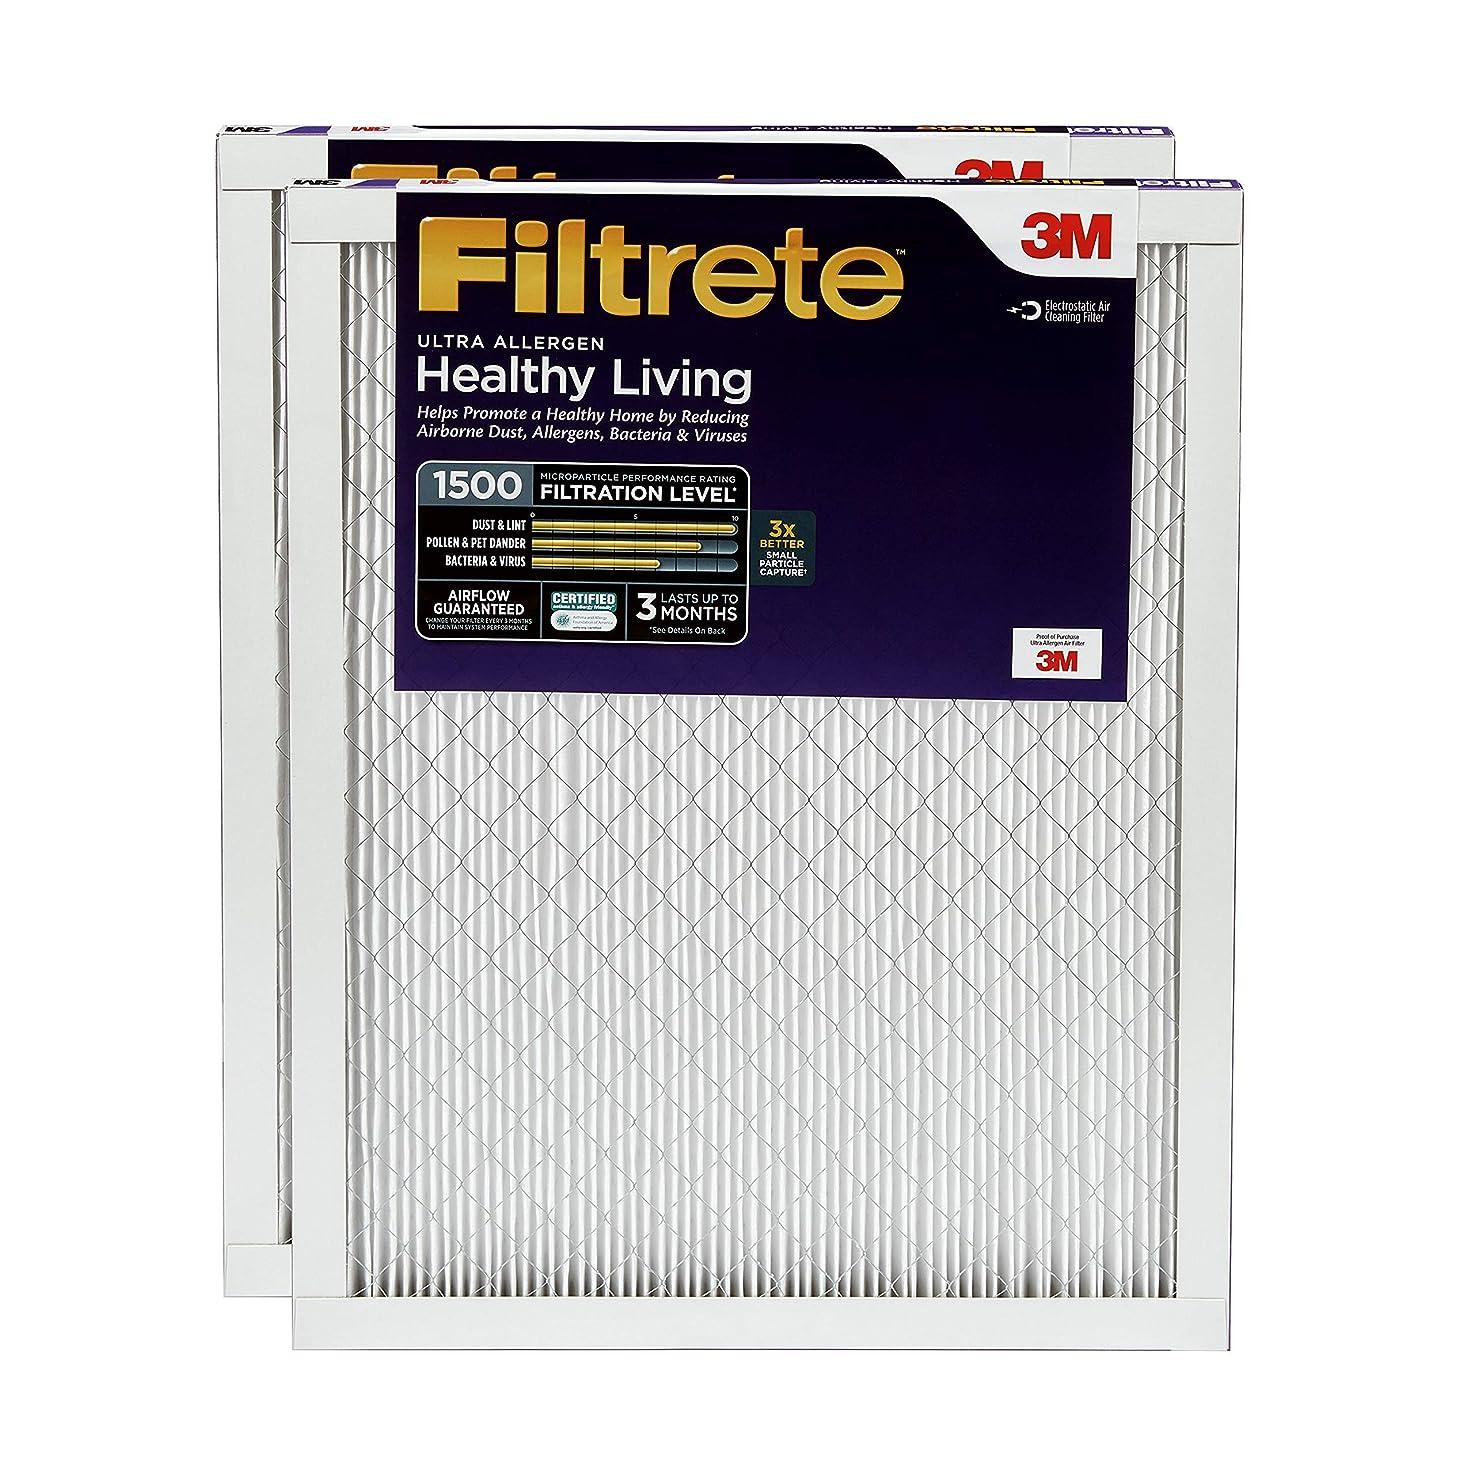 Filtrete 20x20x1, AC Furnace Air Filter, MPR 1500, Healthy Living Ultra Allergen, 2-Pack enqihmqkvynbm1